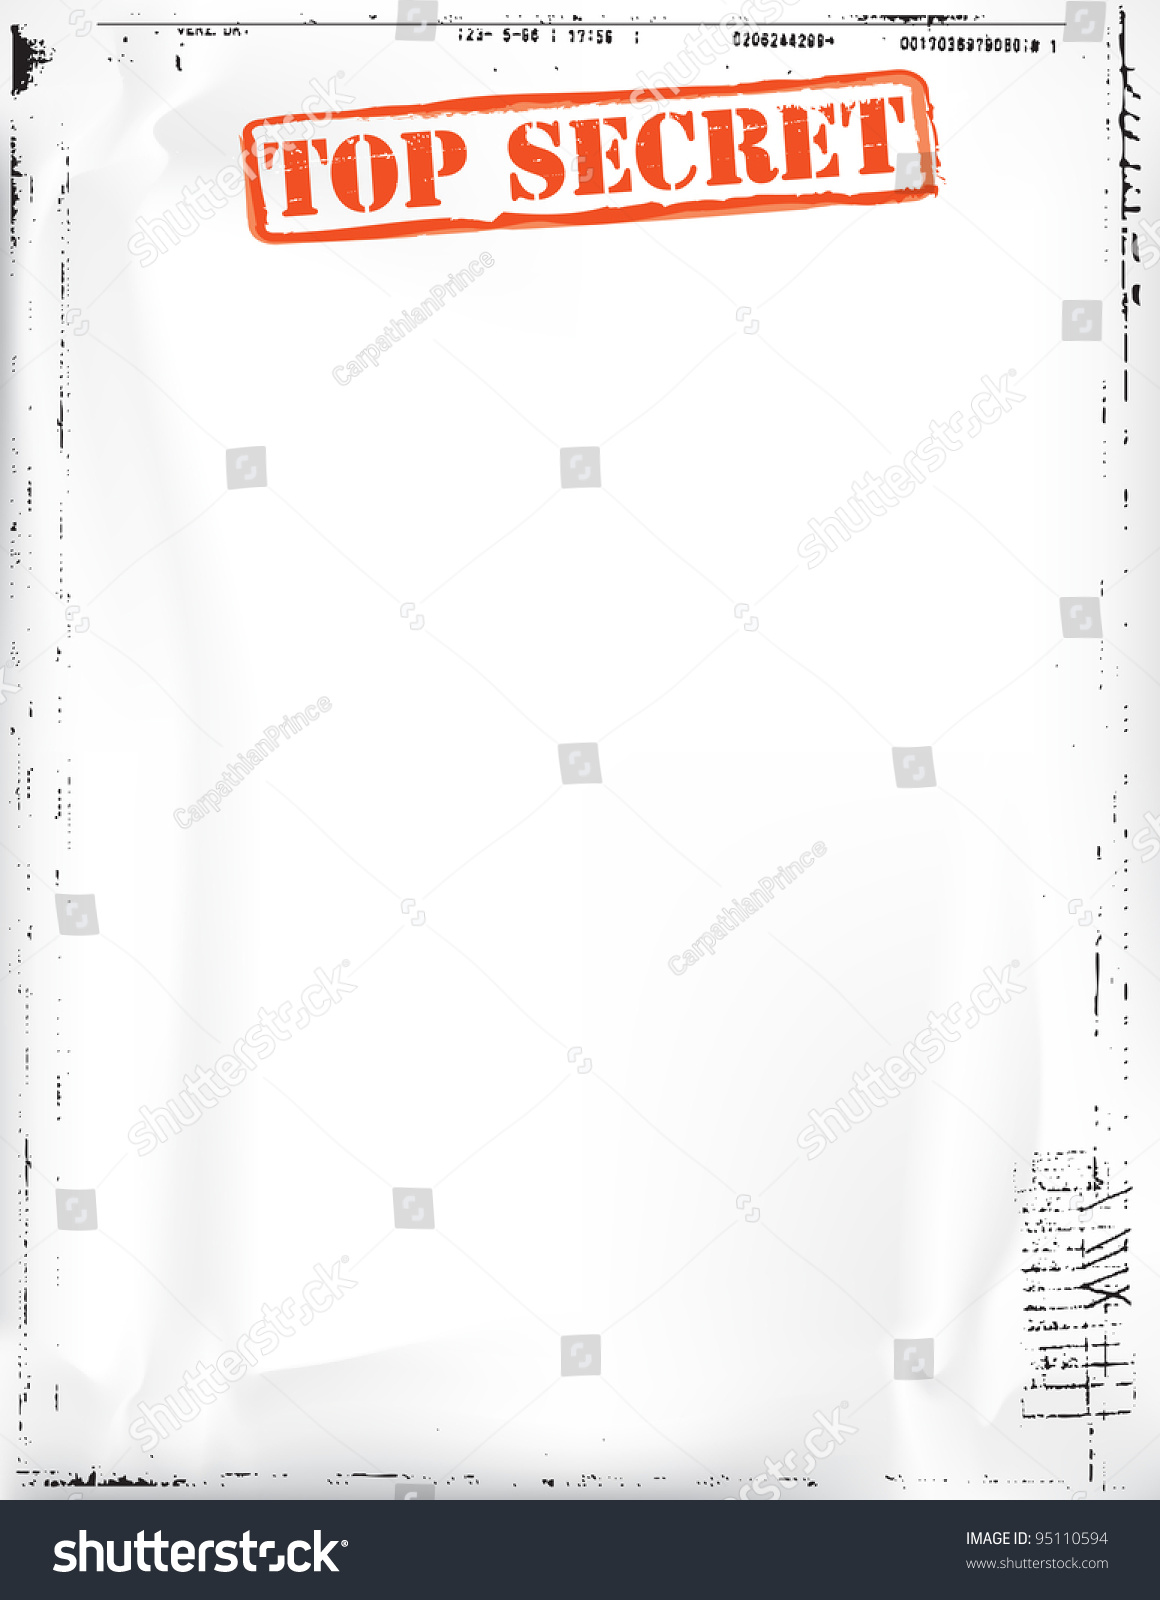 top secret document stock photo 95110594 shutterstock. Black Bedroom Furniture Sets. Home Design Ideas